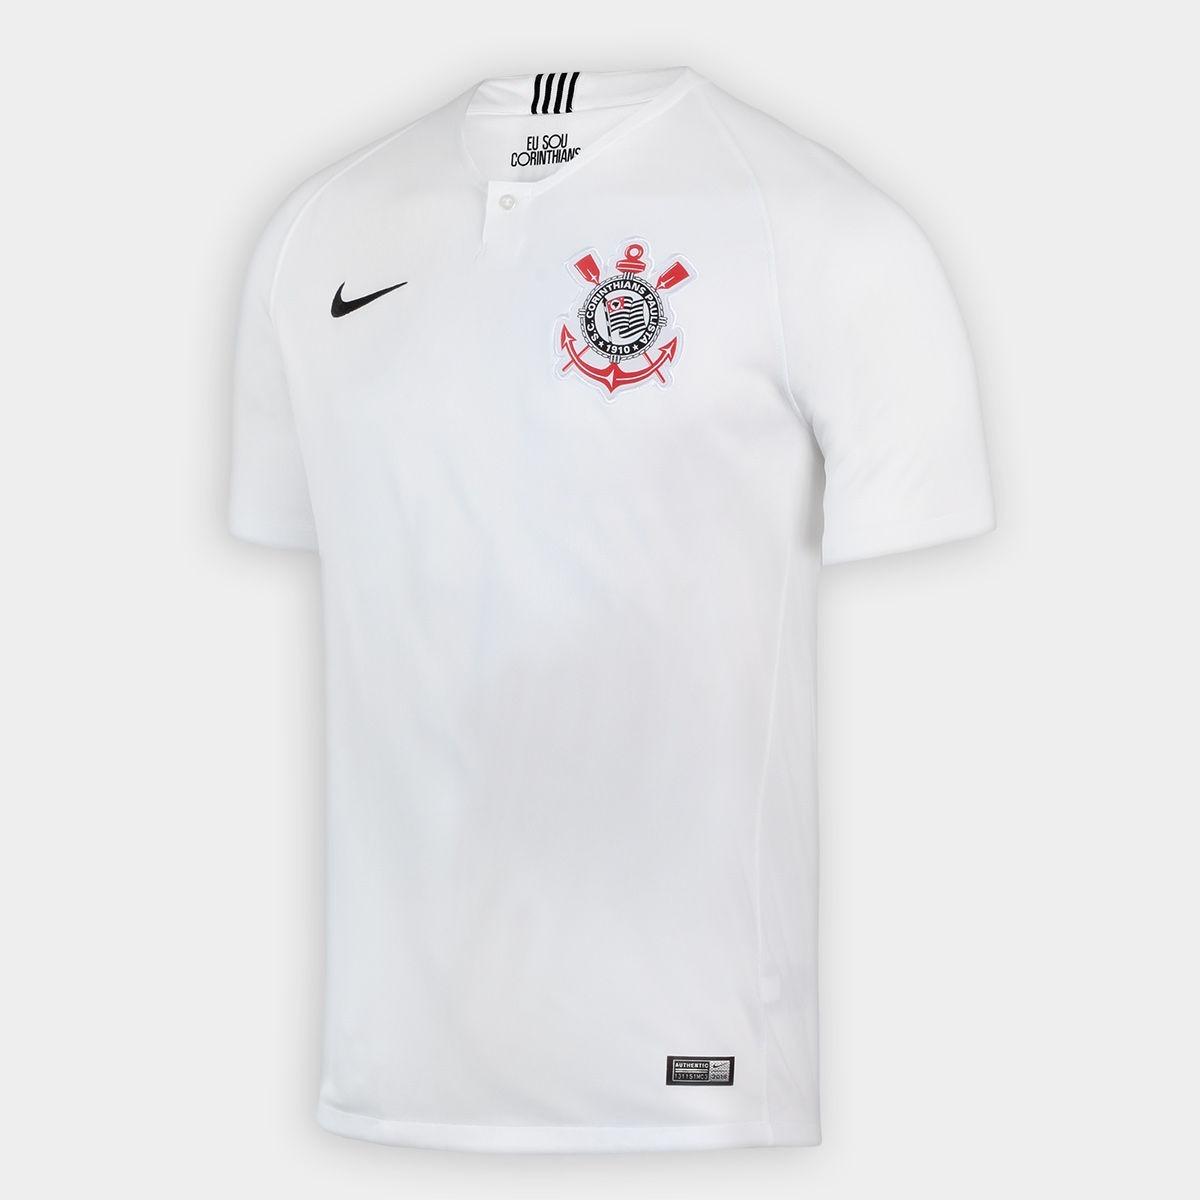 aa542f56bf28a camisa corinthians titular nike 2018 branca preta - original. Carregando  zoom.